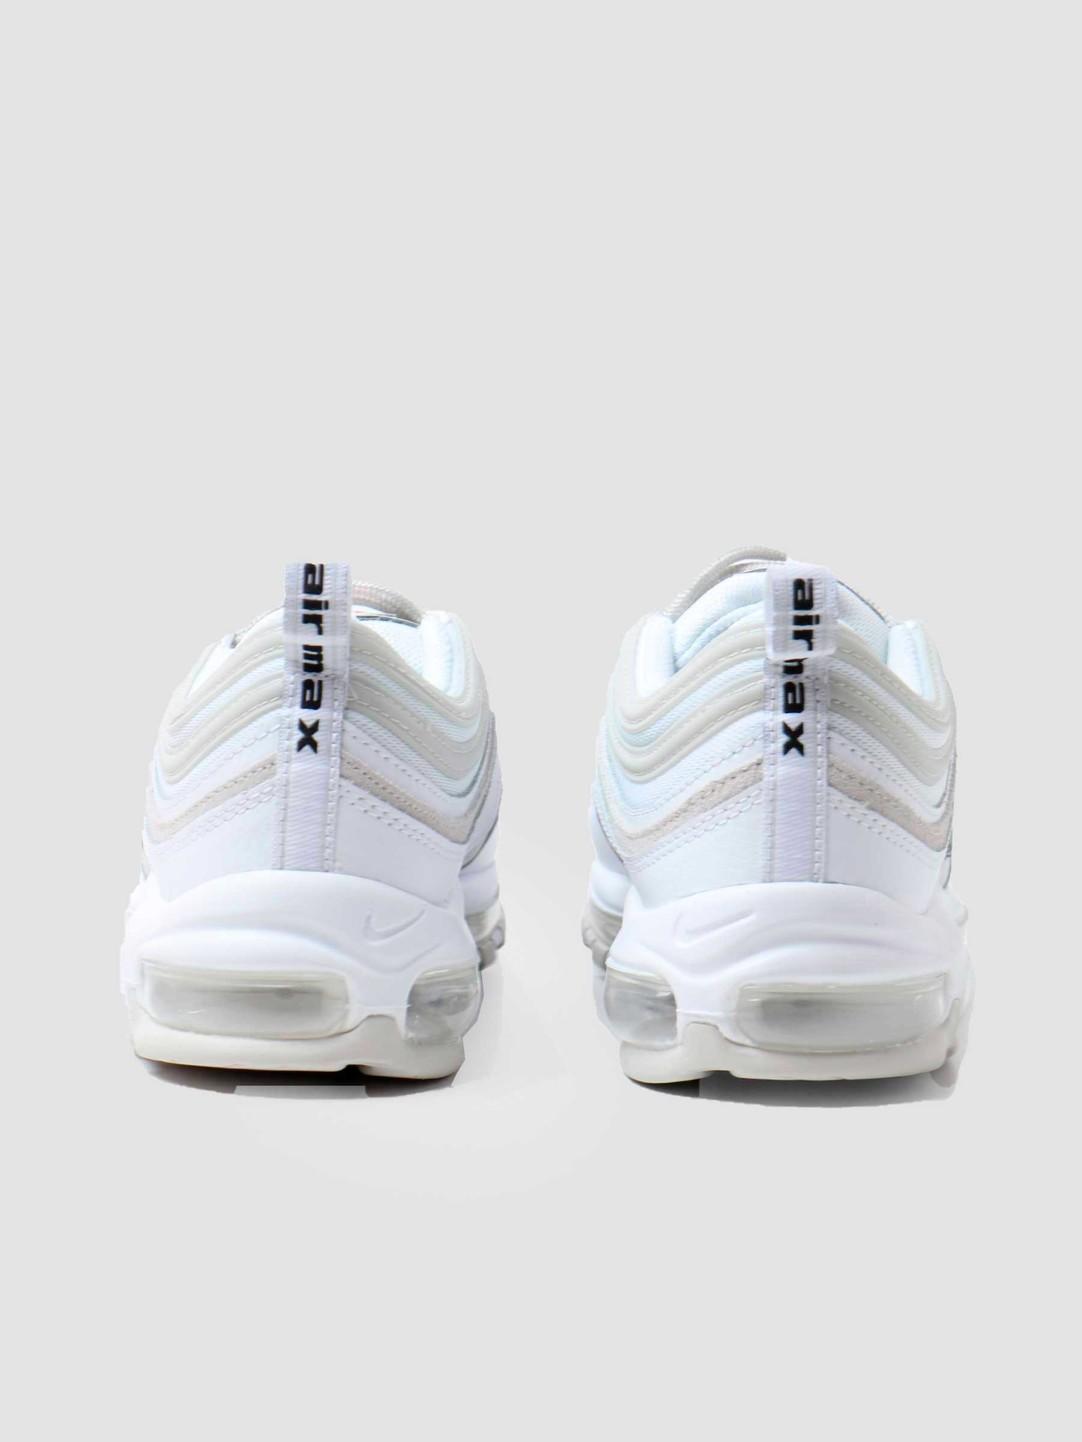 Nike Nike Air Max 97 White Light Bone Black Team Orange DH4105-100